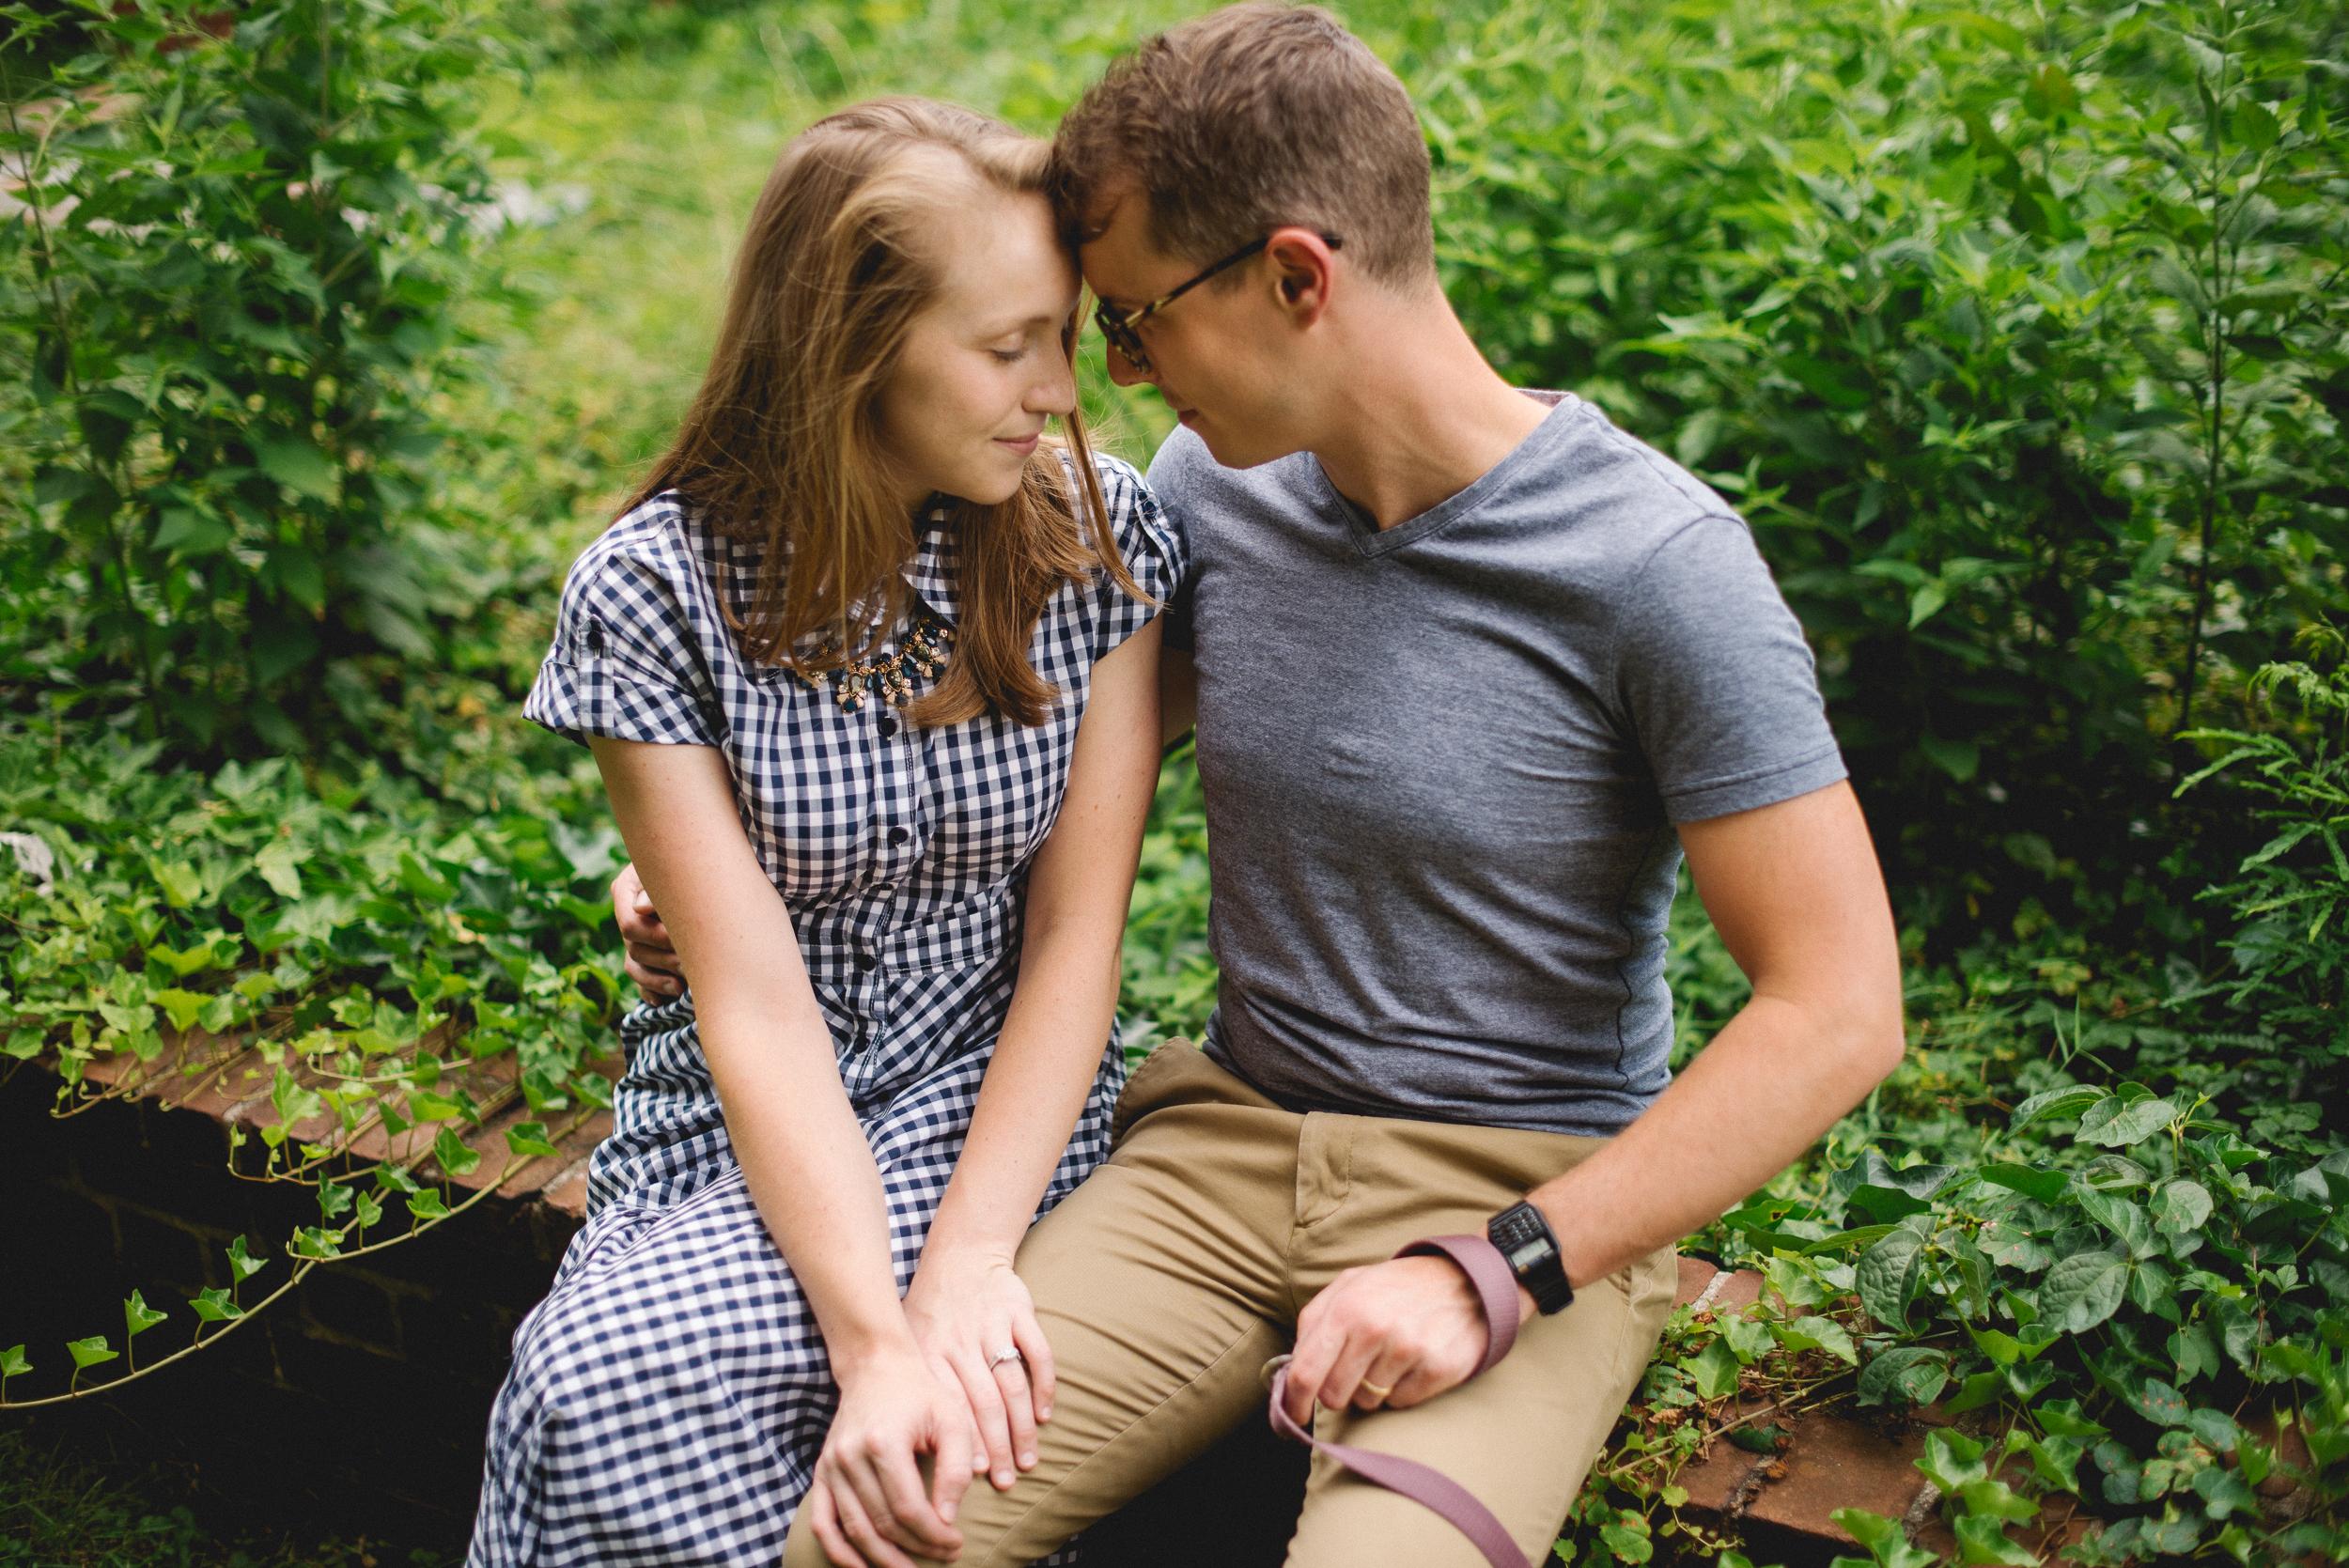 Peaberry-Photography-Society-Hill-Philadelphia-Pennsylvania-Newlyweds-Just-Married-010.jpg